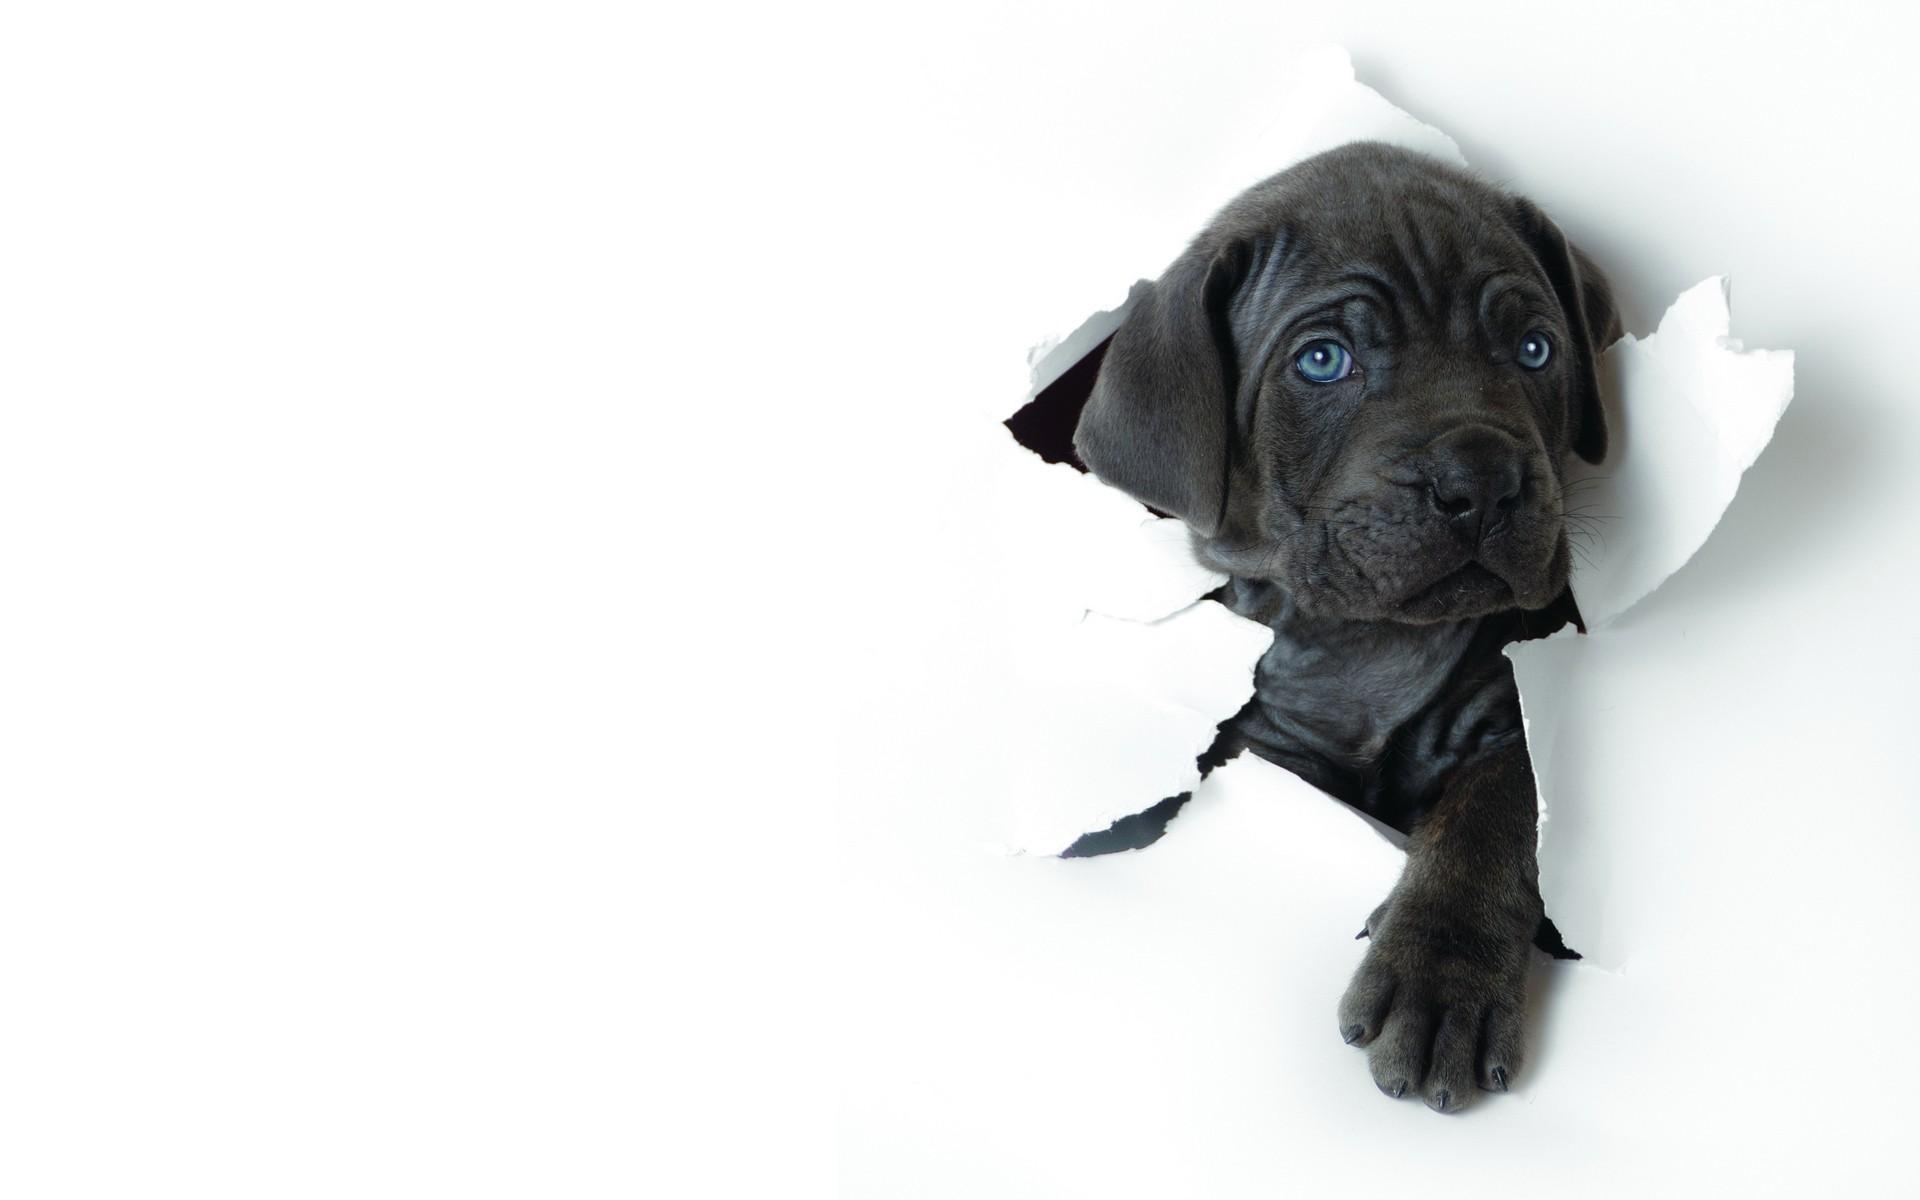 dog background | Kjpwg com